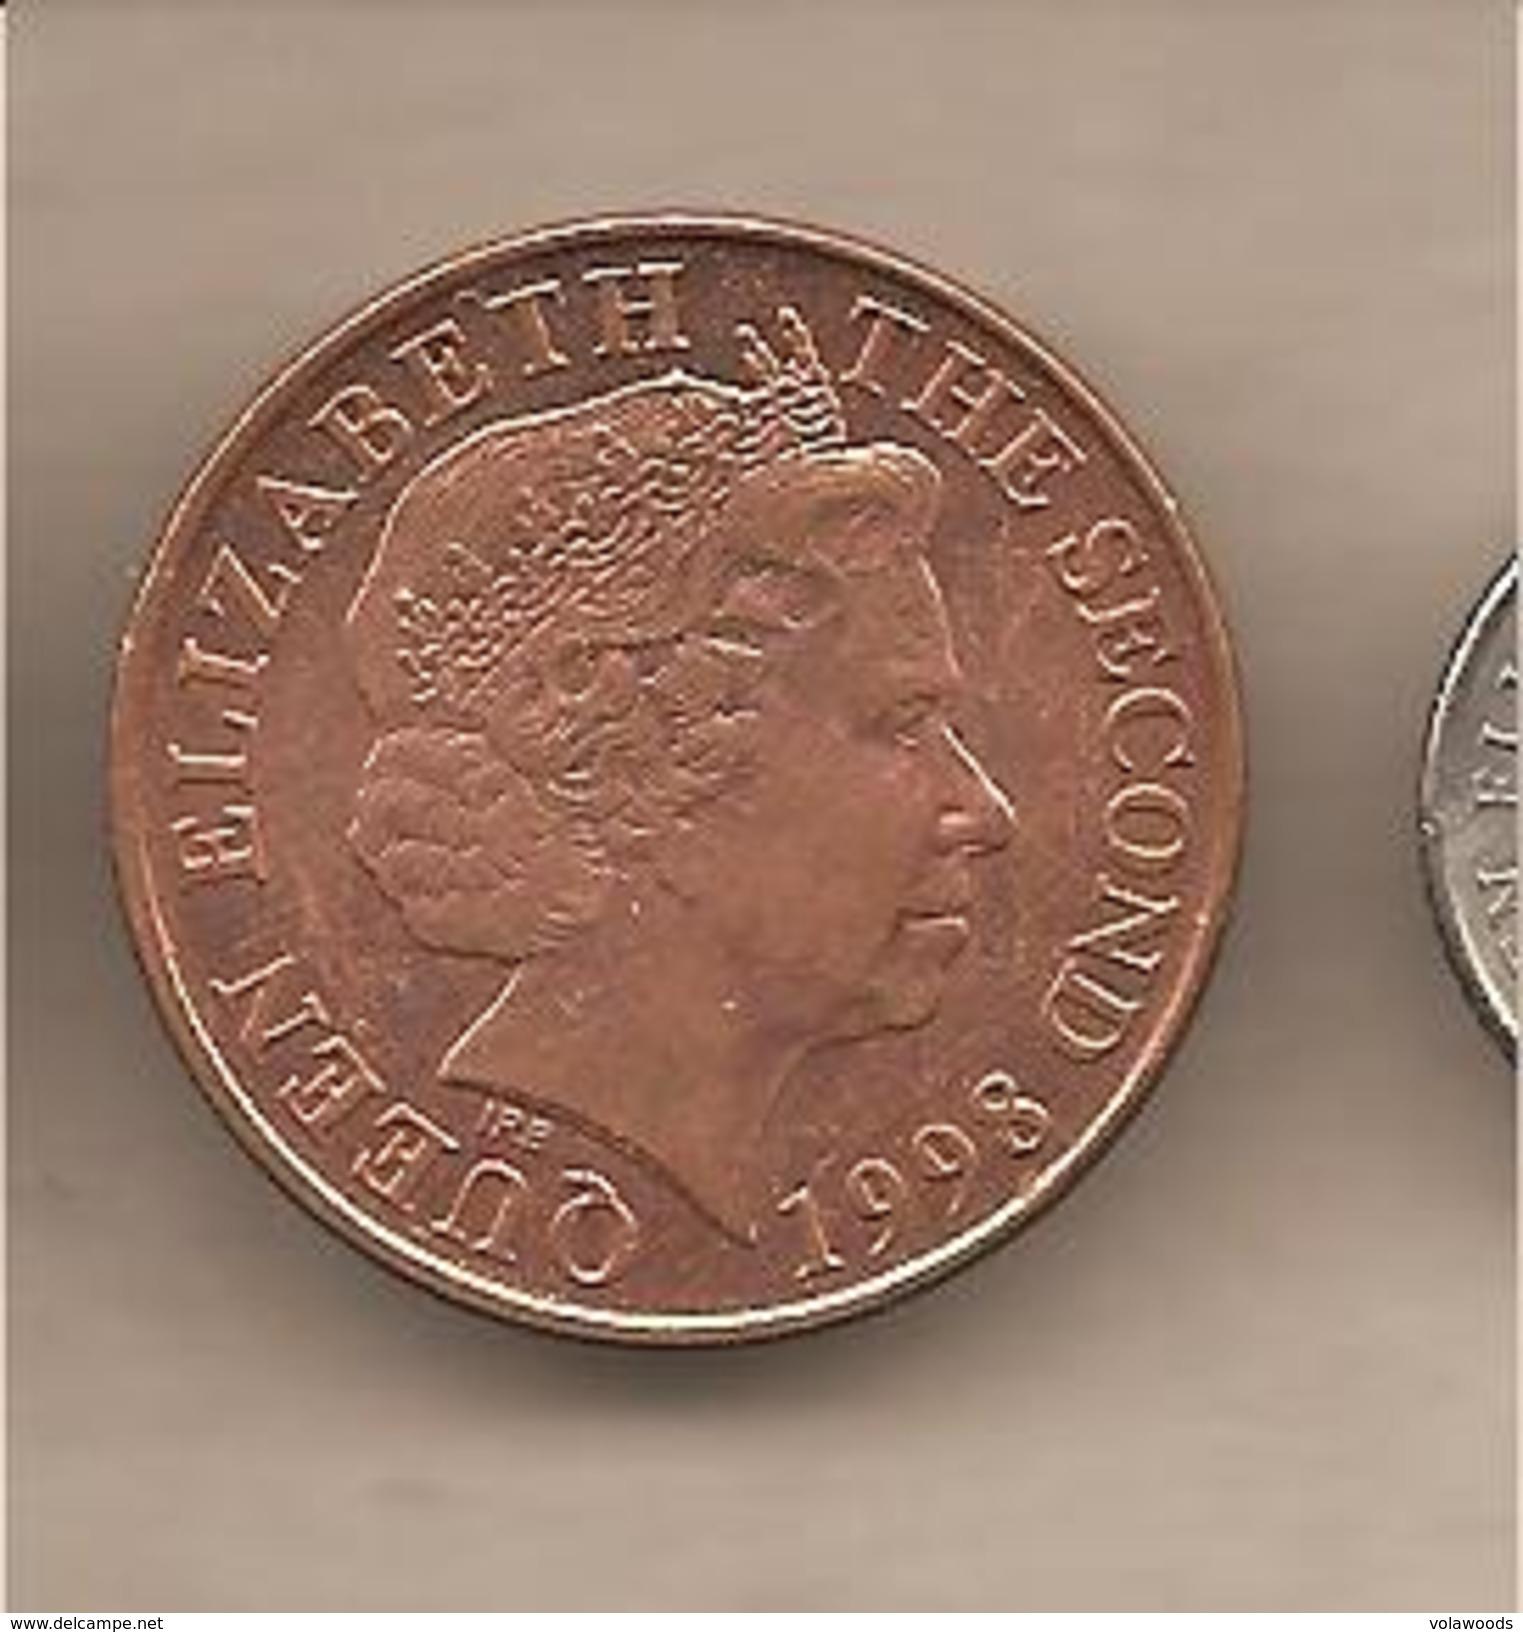 Jersey - Moneta Circolata Da 2 Pence - 1998 - Jersey